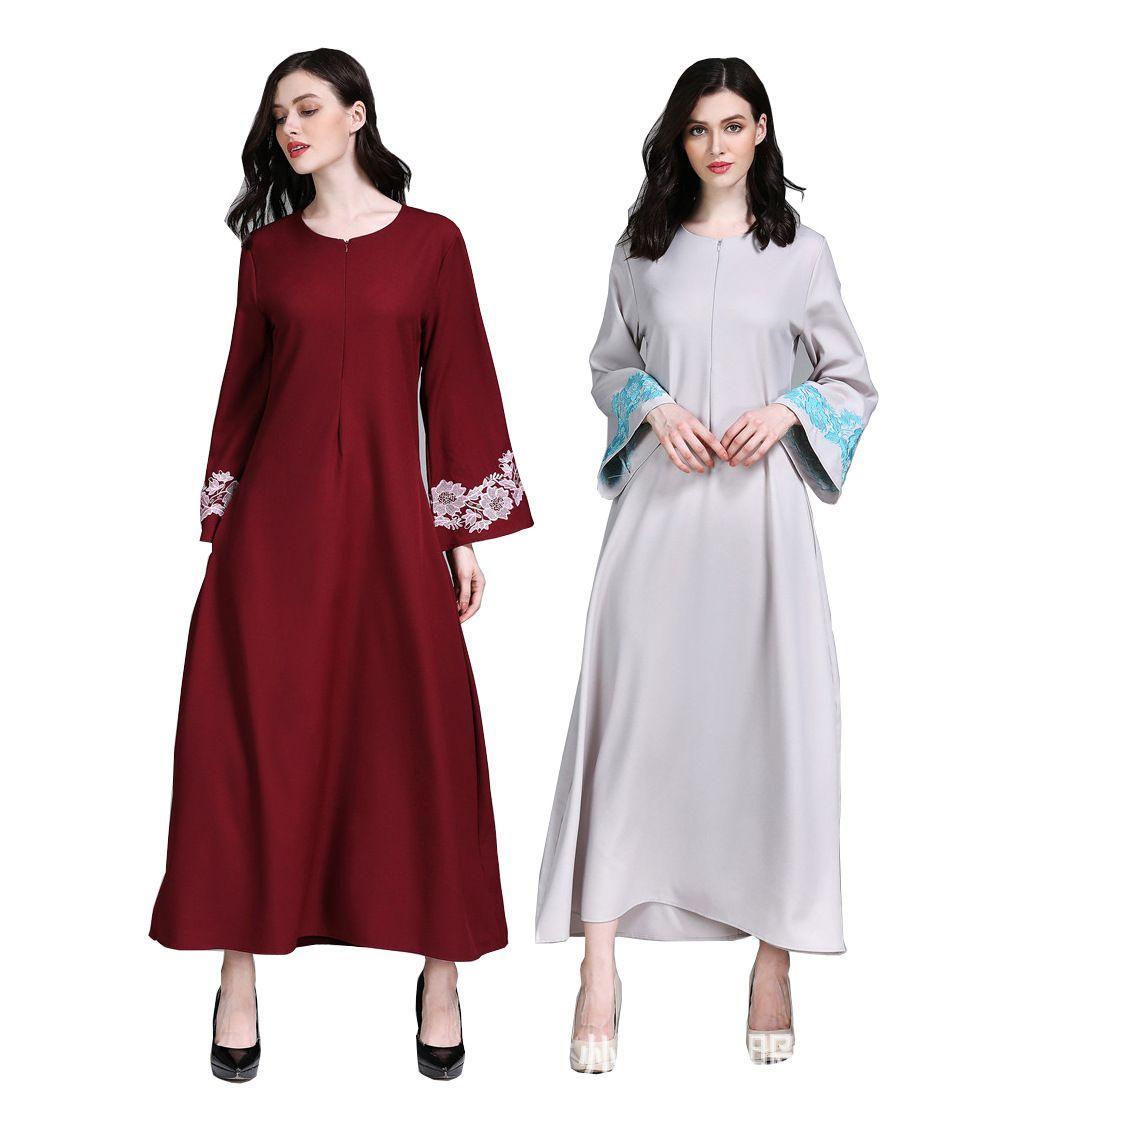 06bd0edfa8479 Women Dubai Abaya Muslim Dress Islamic Clothing Embroidery Ruffles Flare  Sleeve Arab Turkish Robes Front Zipper Musulmane Kaftan Sun Dresses Sale  Women ...